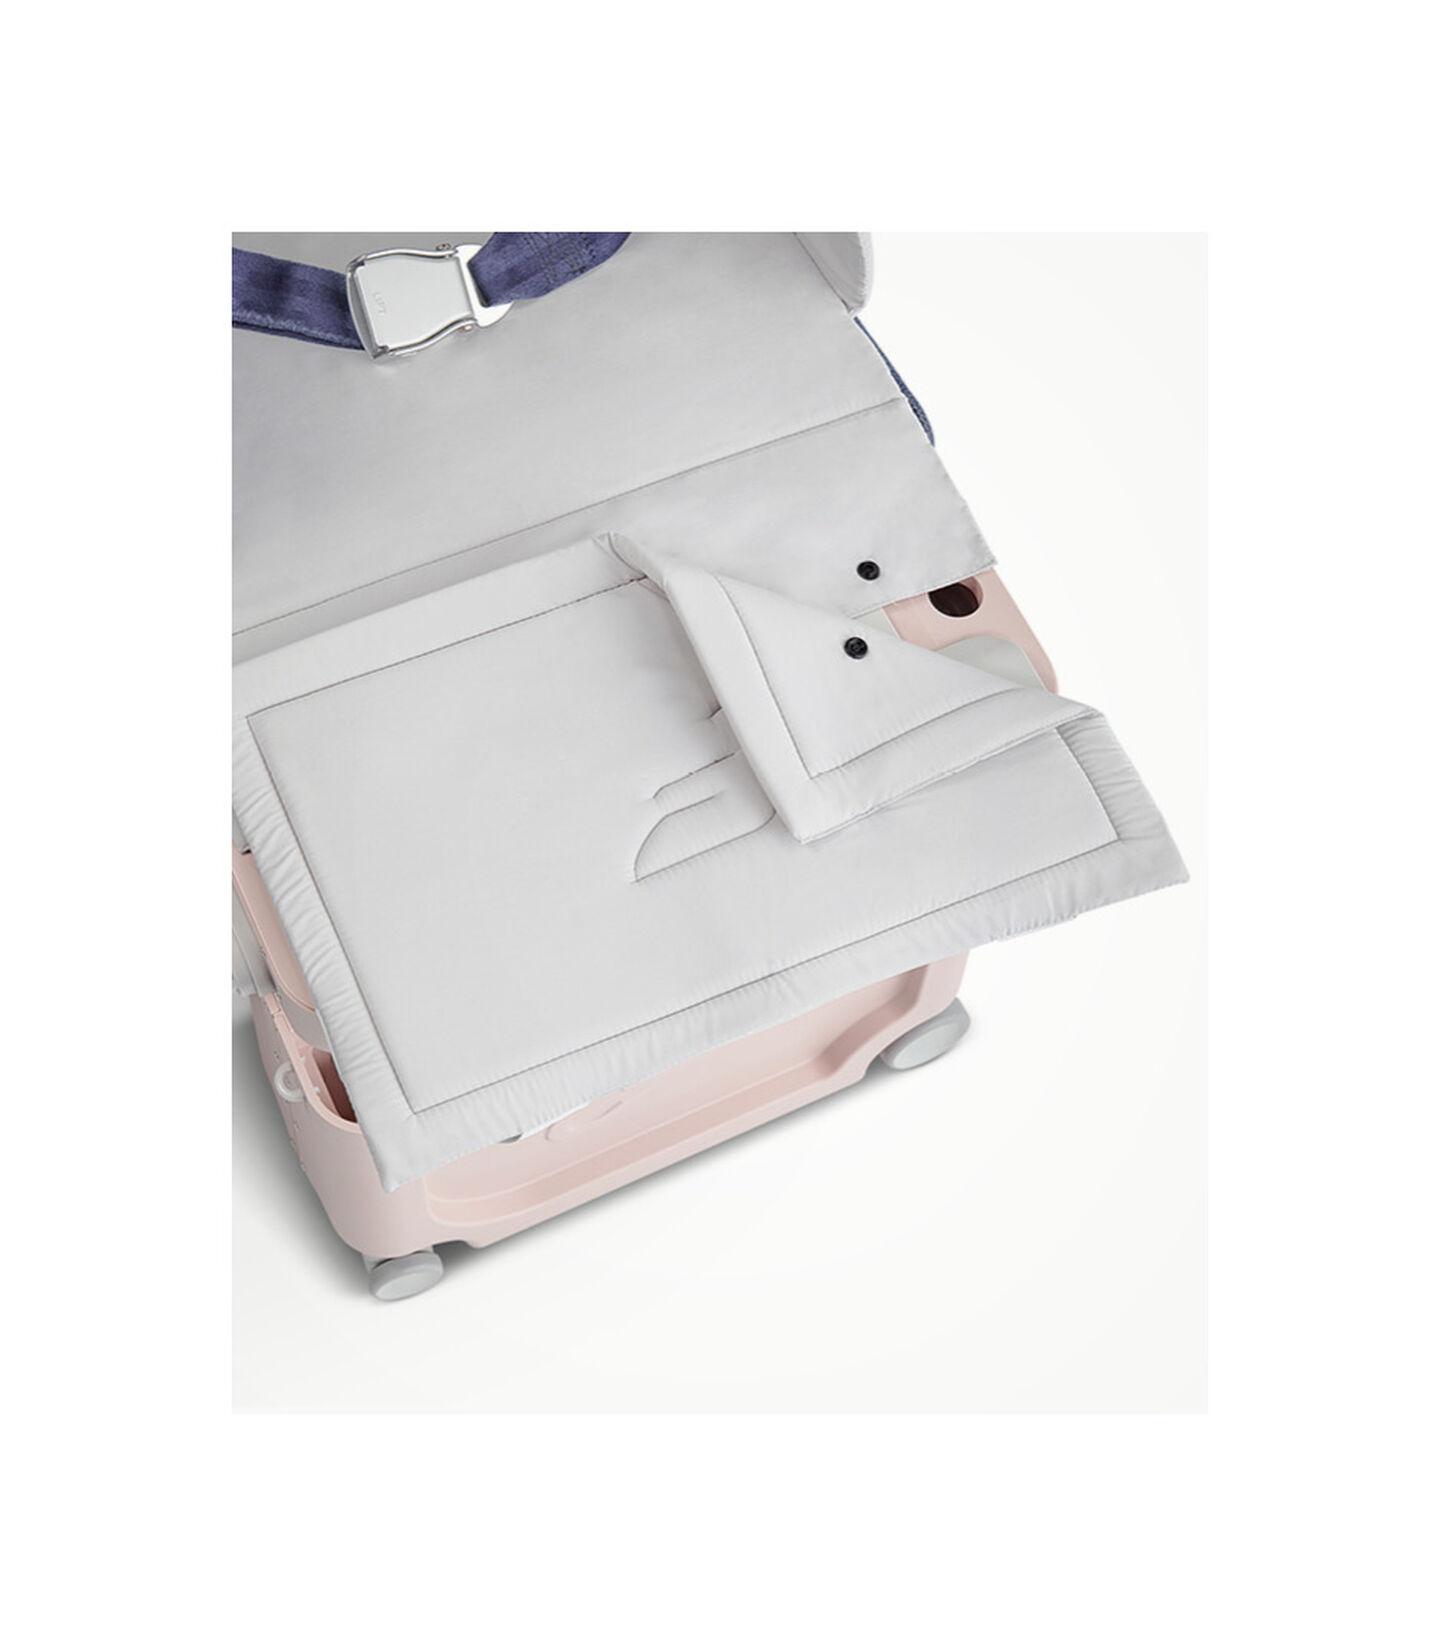 JetKids™ by Stokke® BedBox V3 in Pink Lemonade. Detachable Mattress. view 10